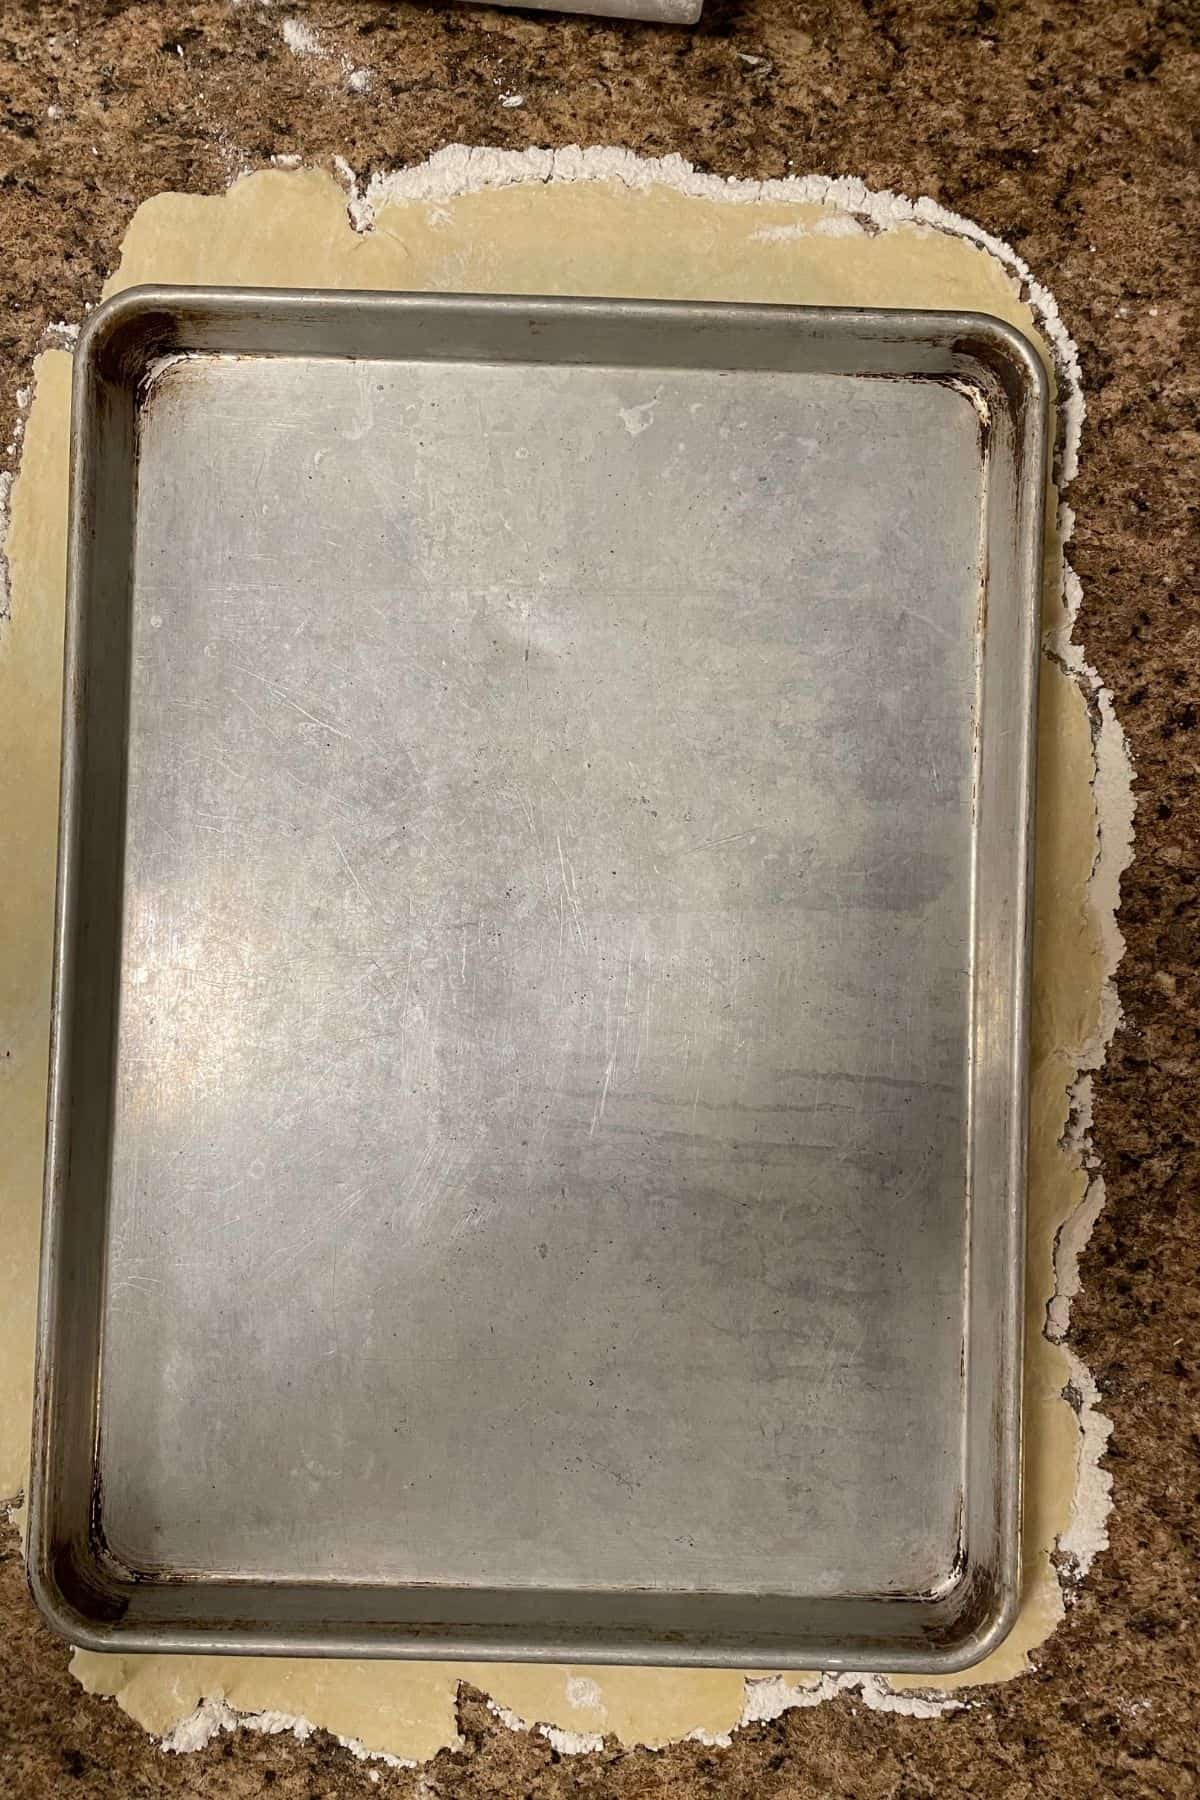 sheet pan sitting on top of pie crust